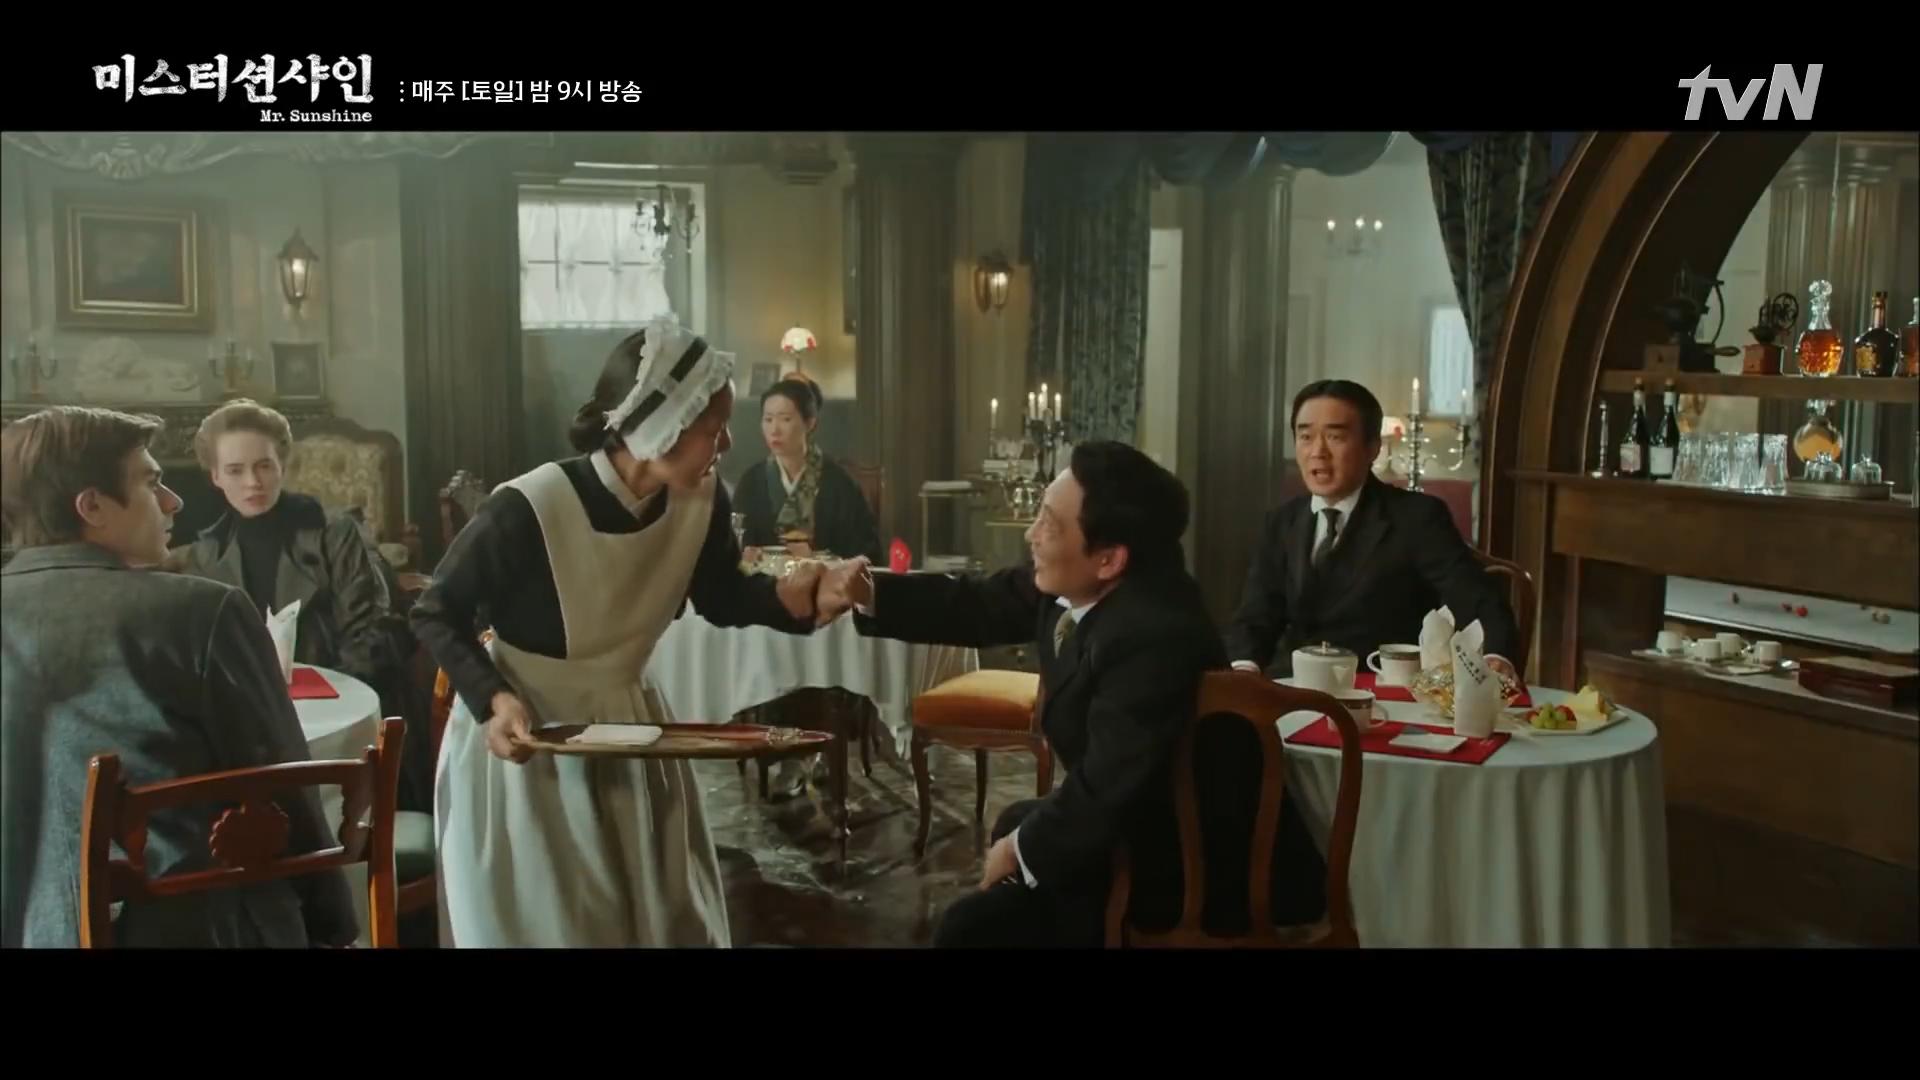 [1] Mr. Sunshine - Charisma